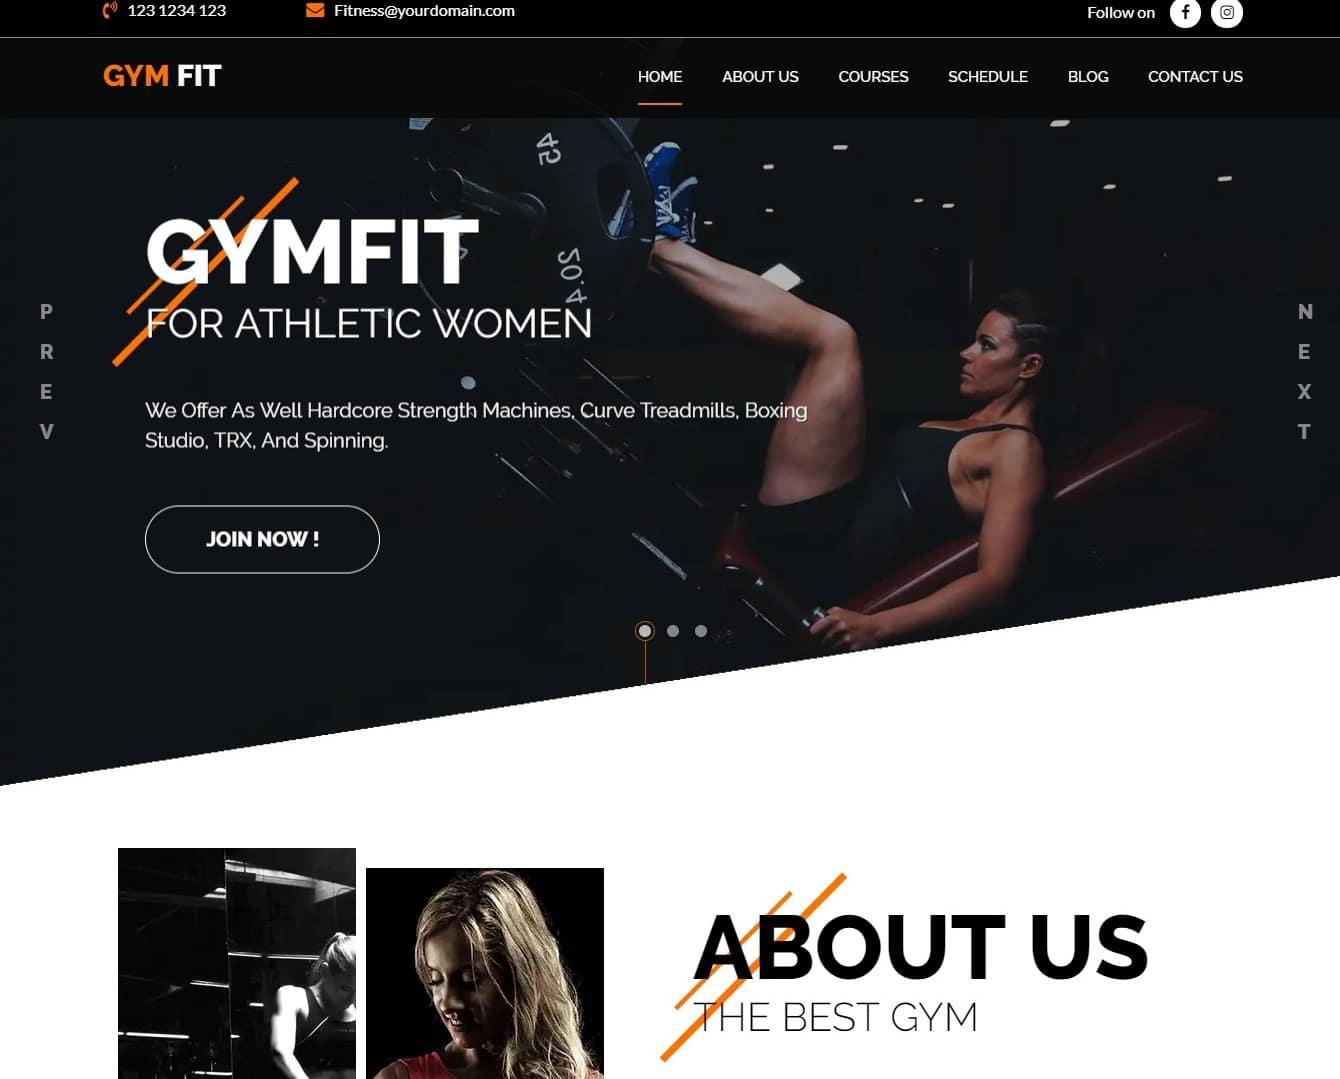 gymfit-html-fitness-website-template